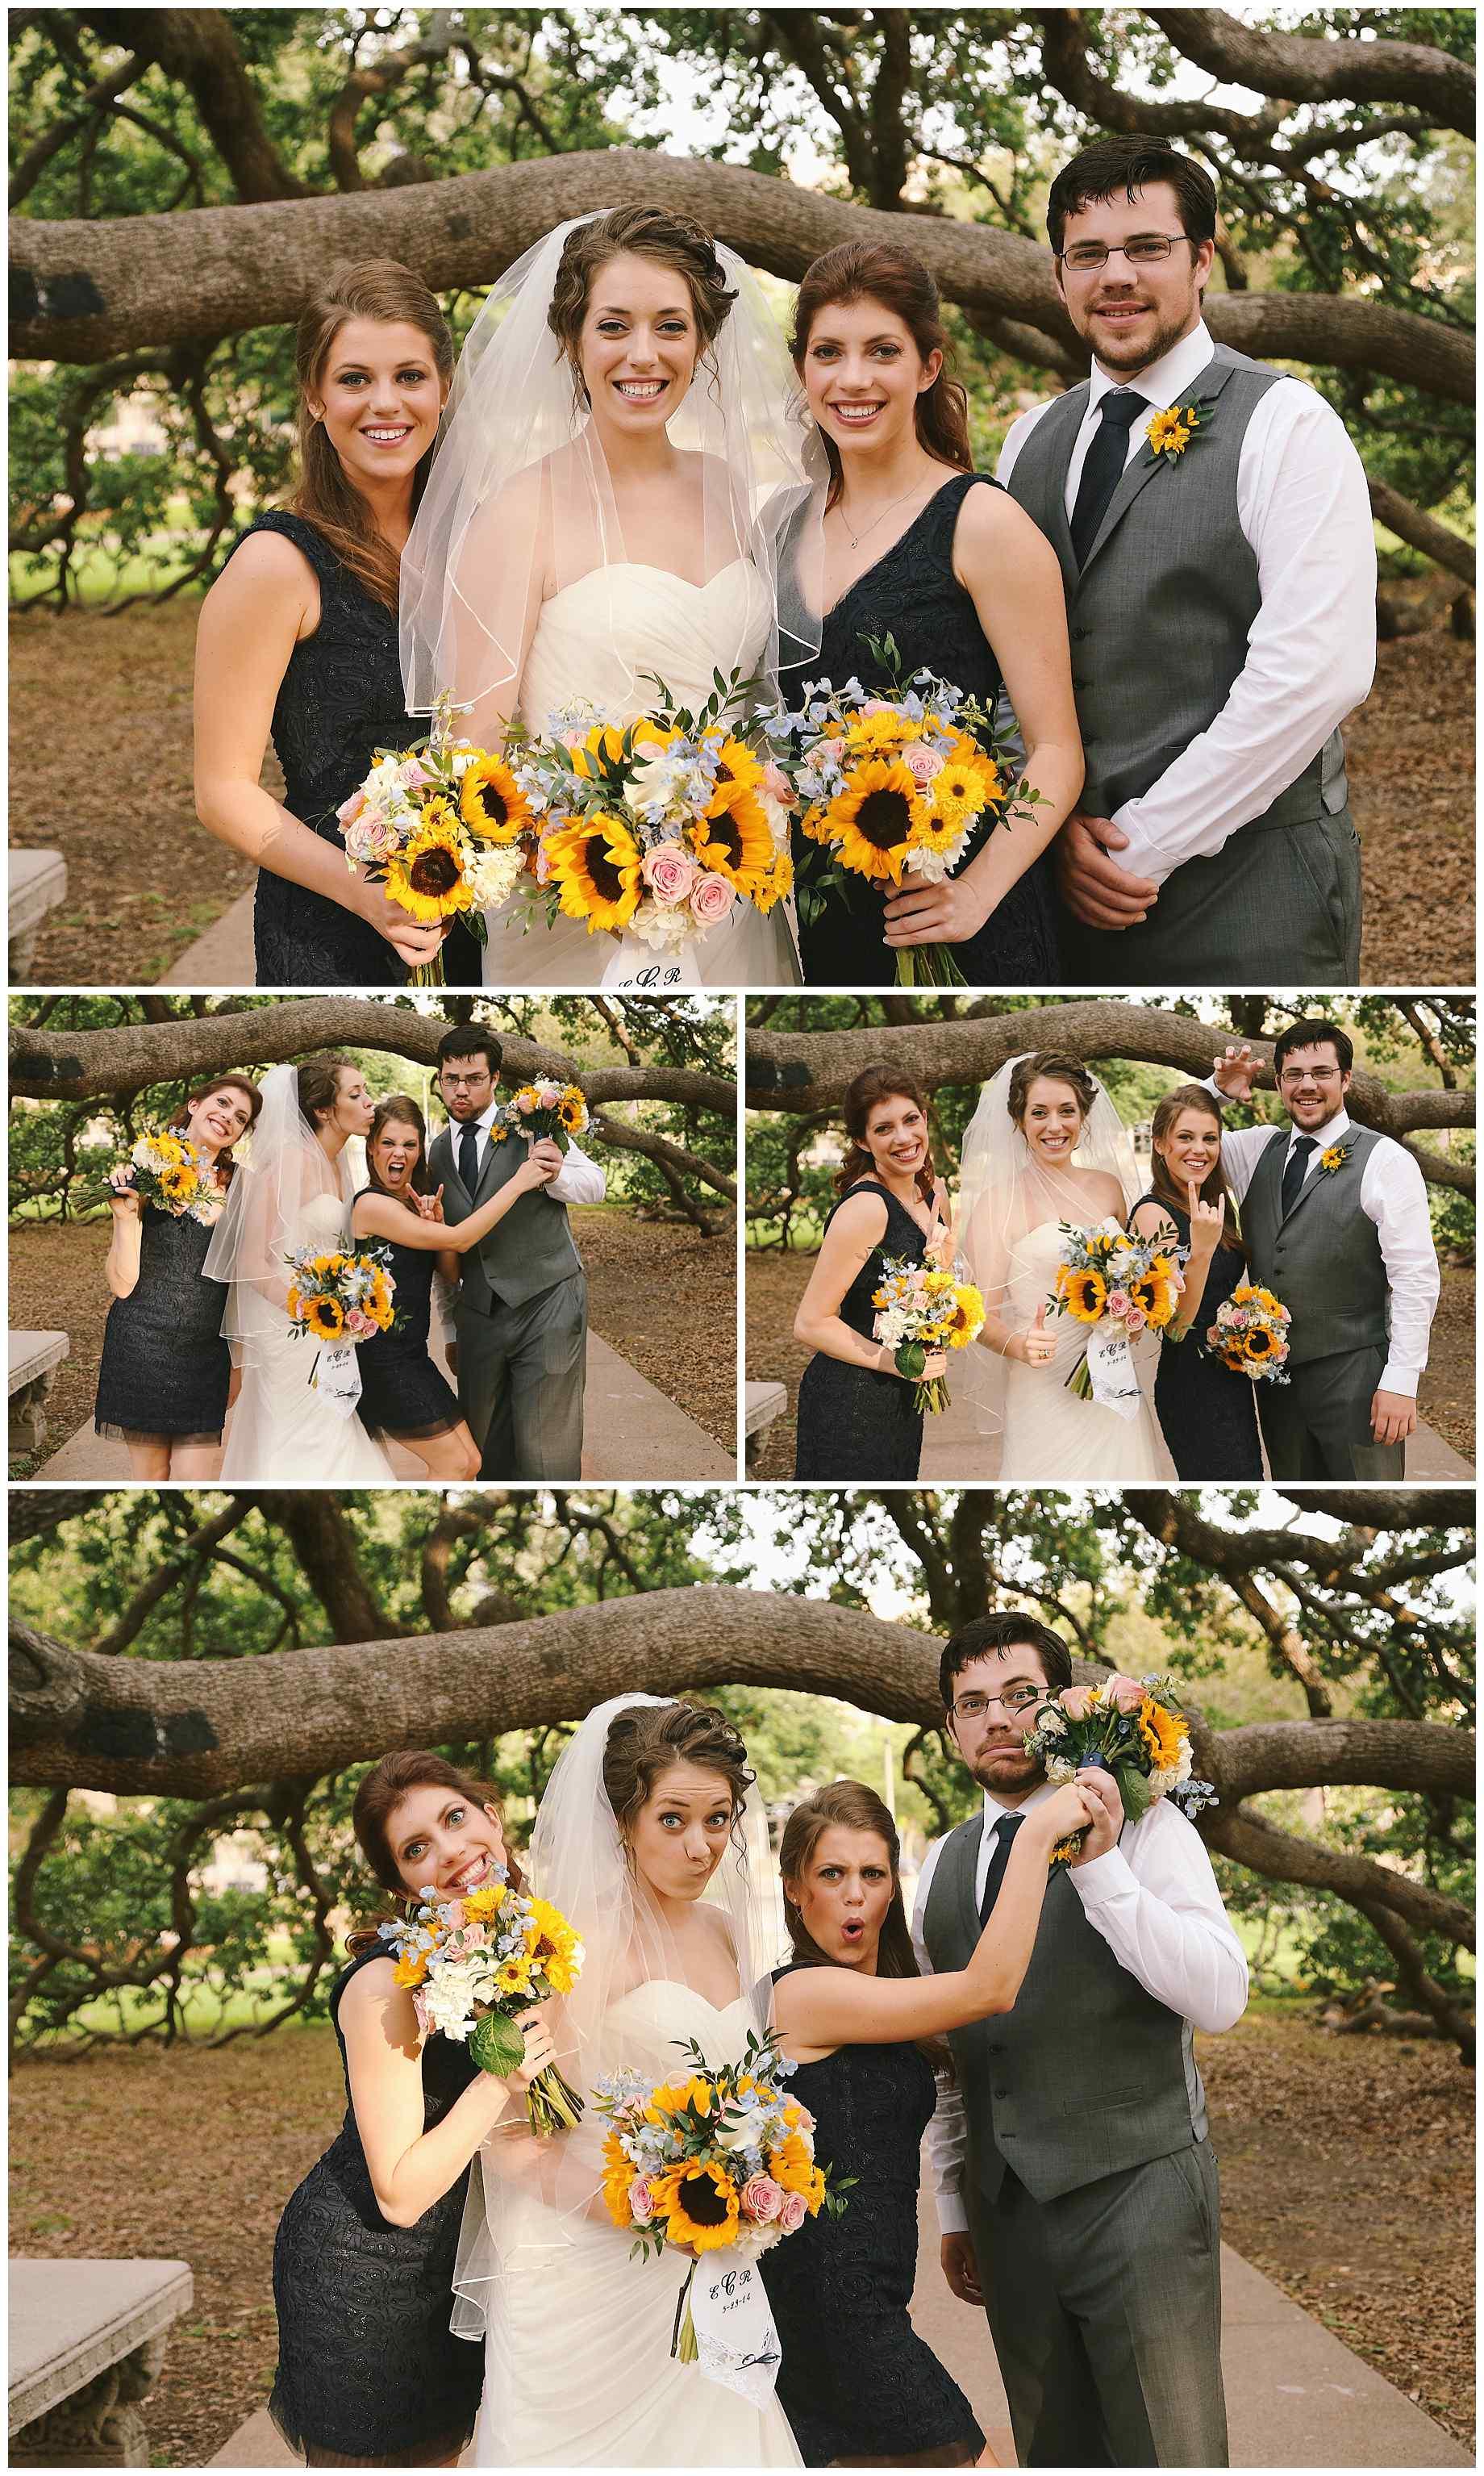 aggie-century-tree-wedding-21